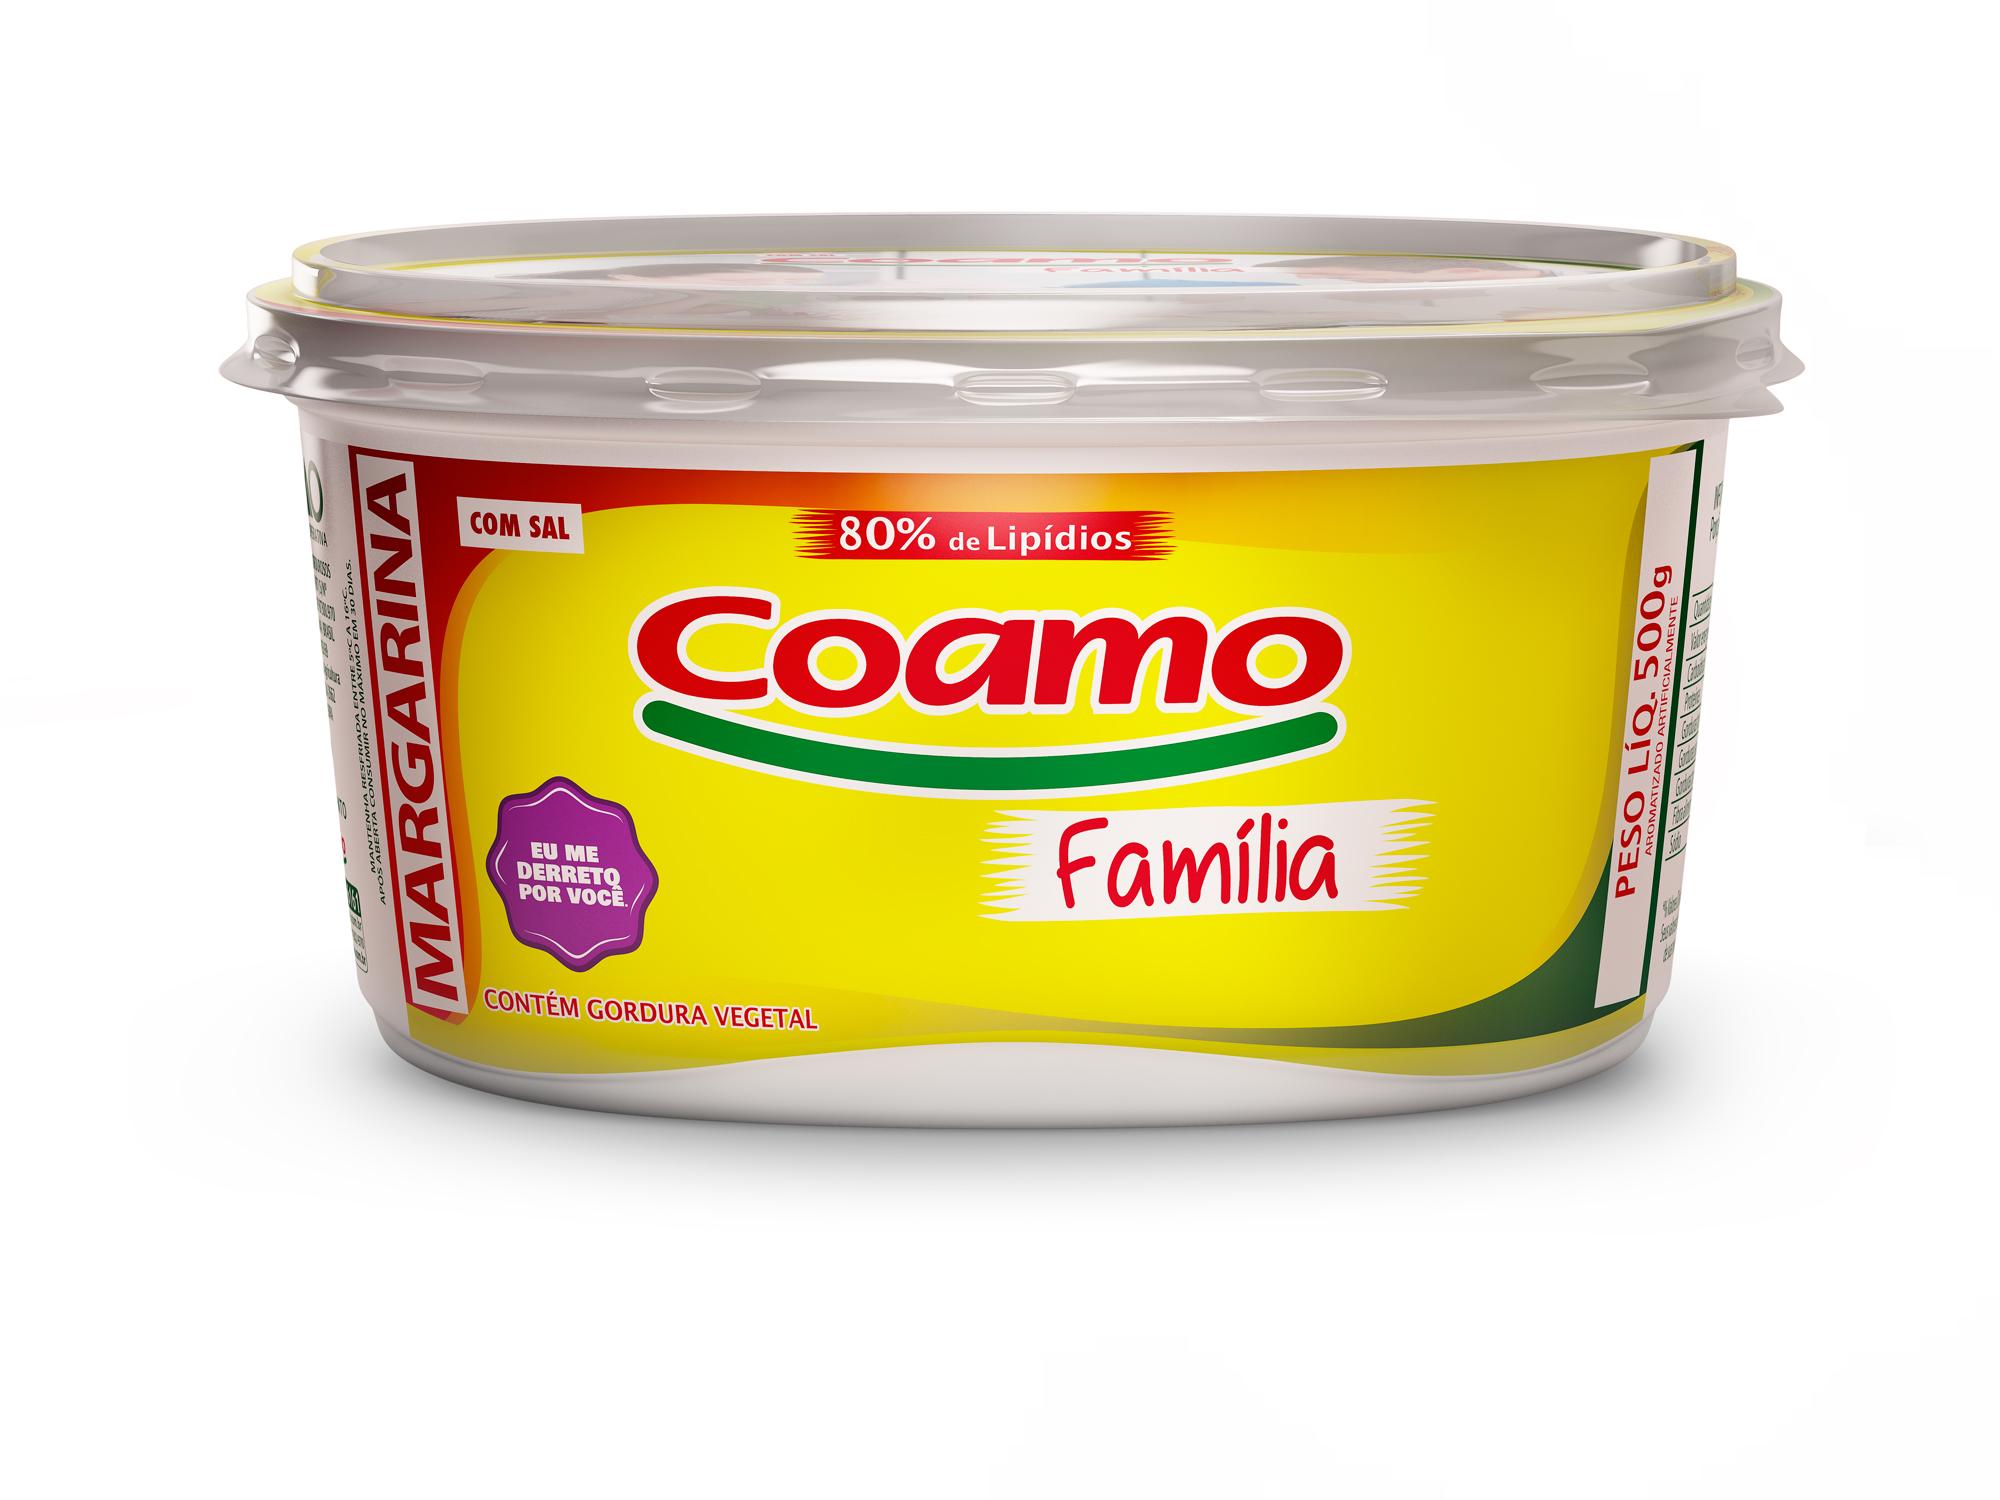 MARGARINA COM SAL 80 % FAMÍLIA COAMO 500 G